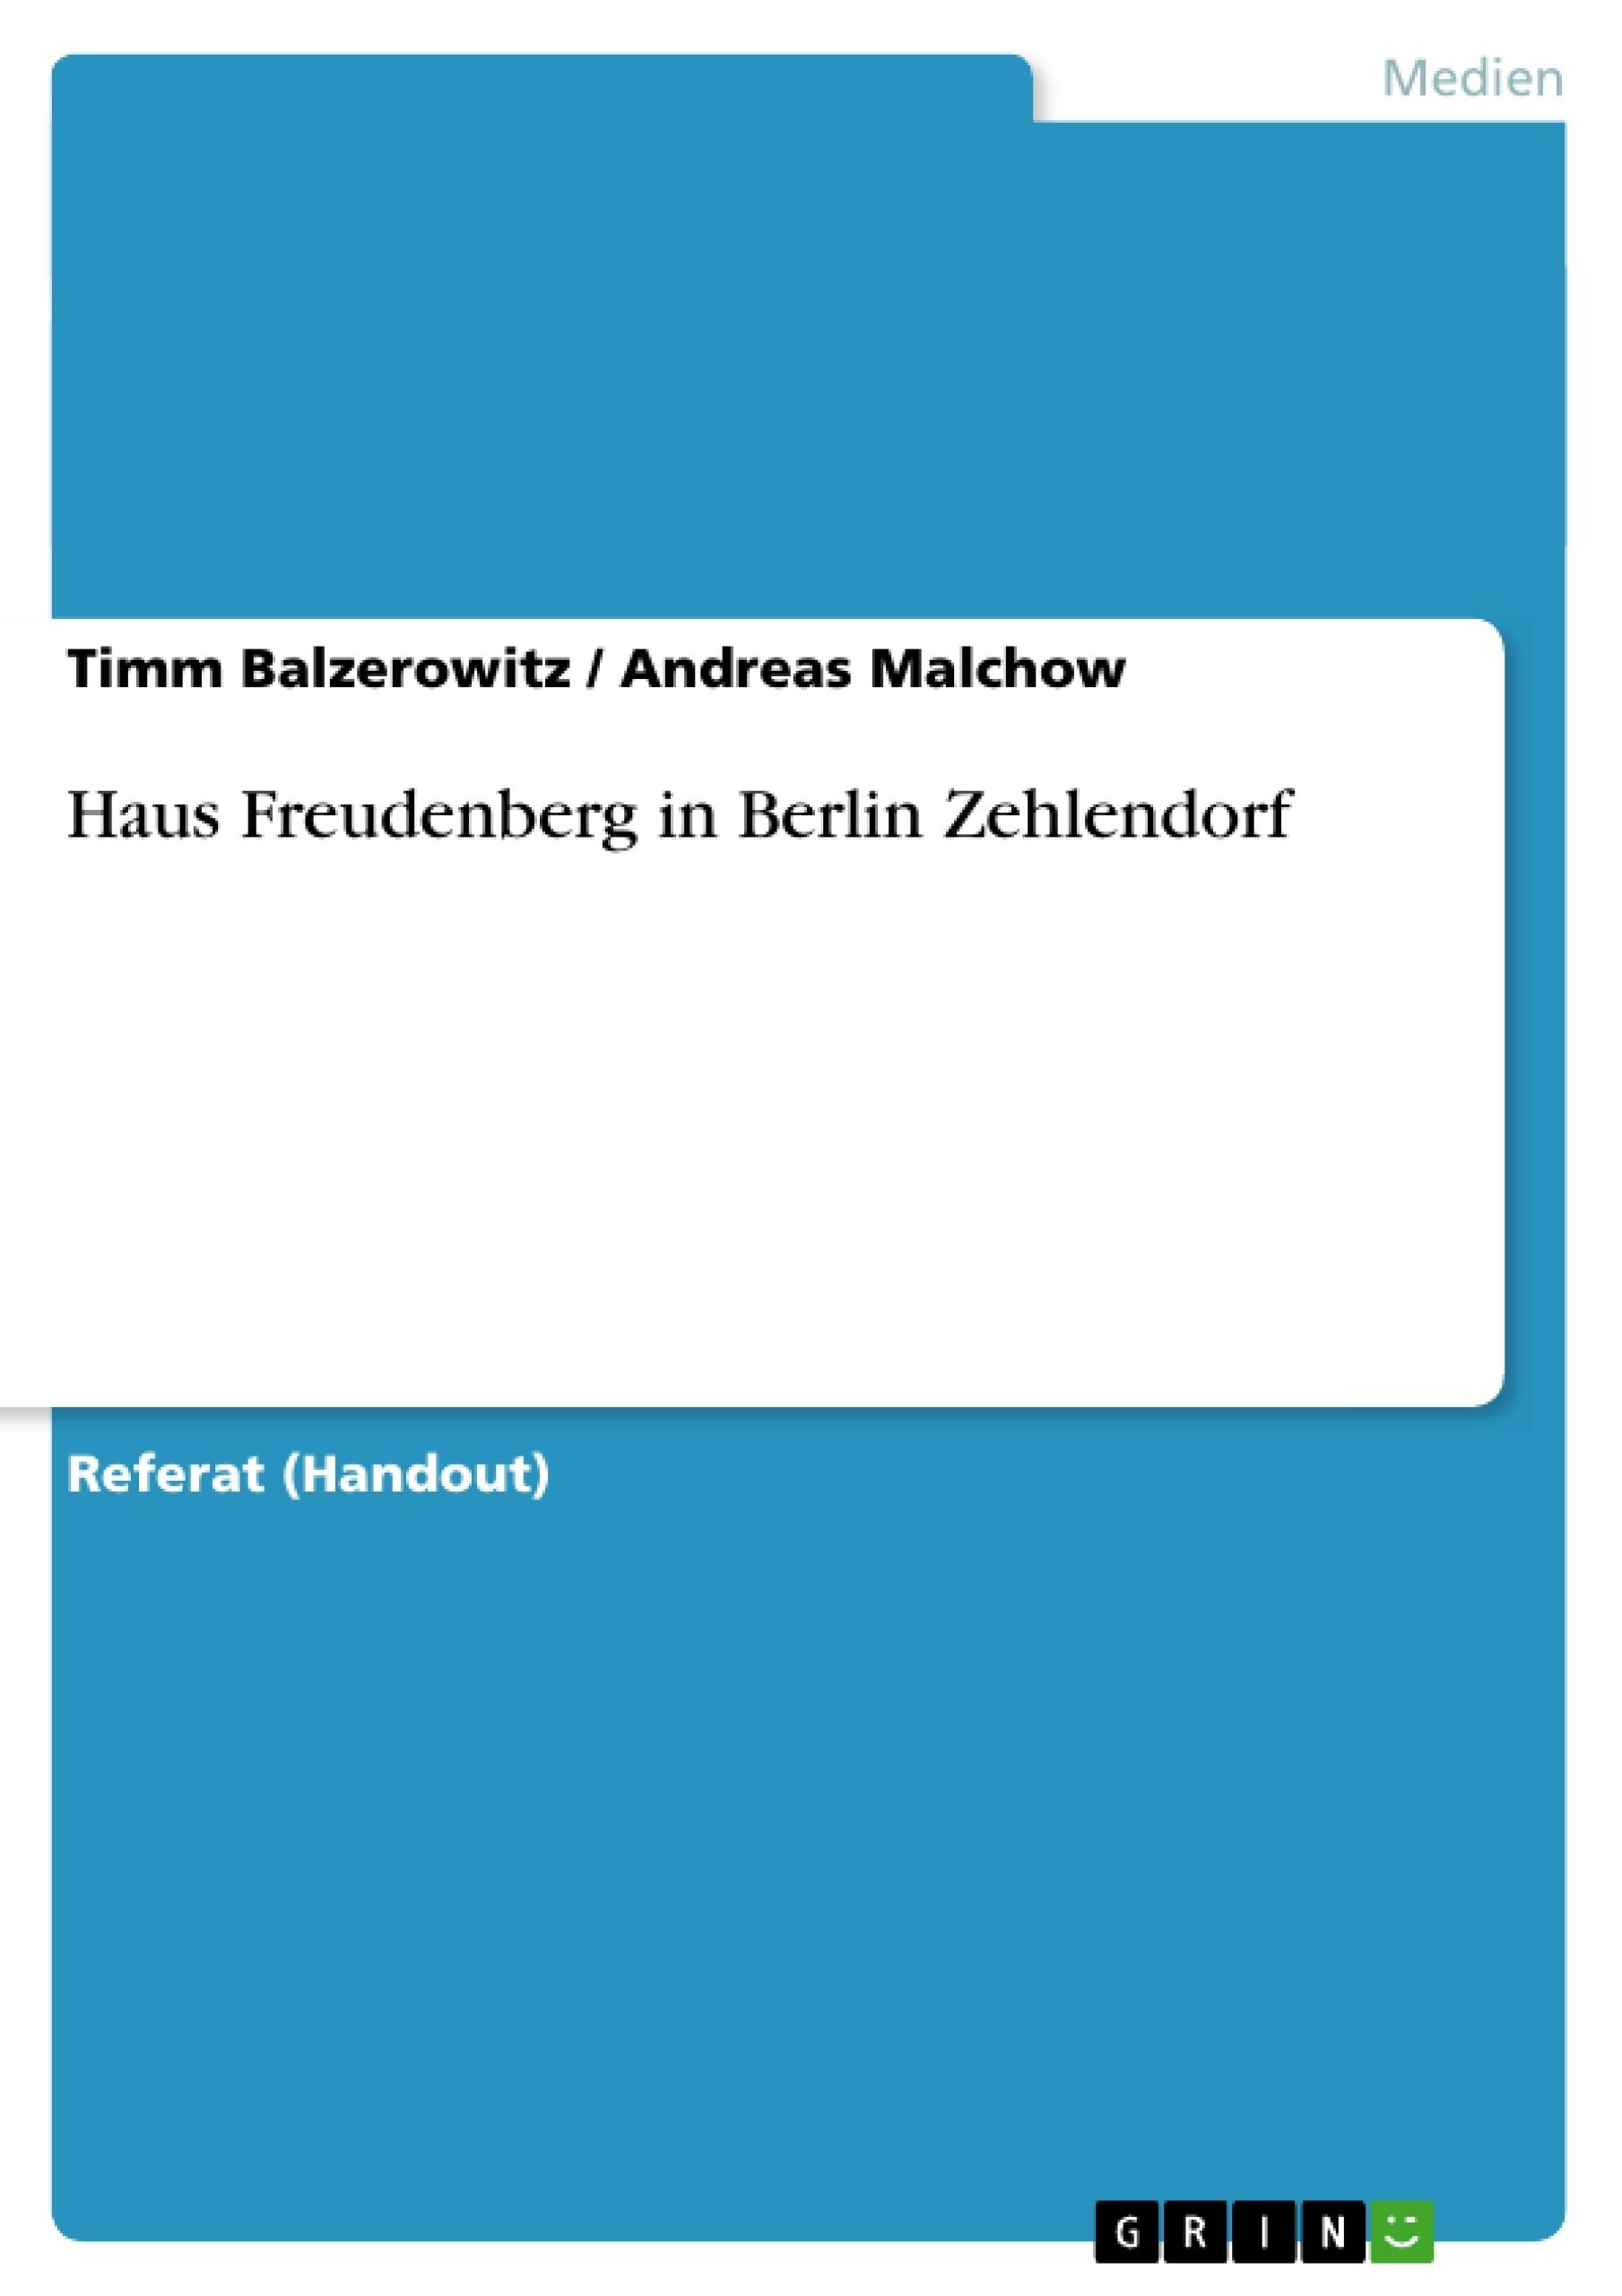 Titel: Haus Freudenberg in Berlin Zehlendorf